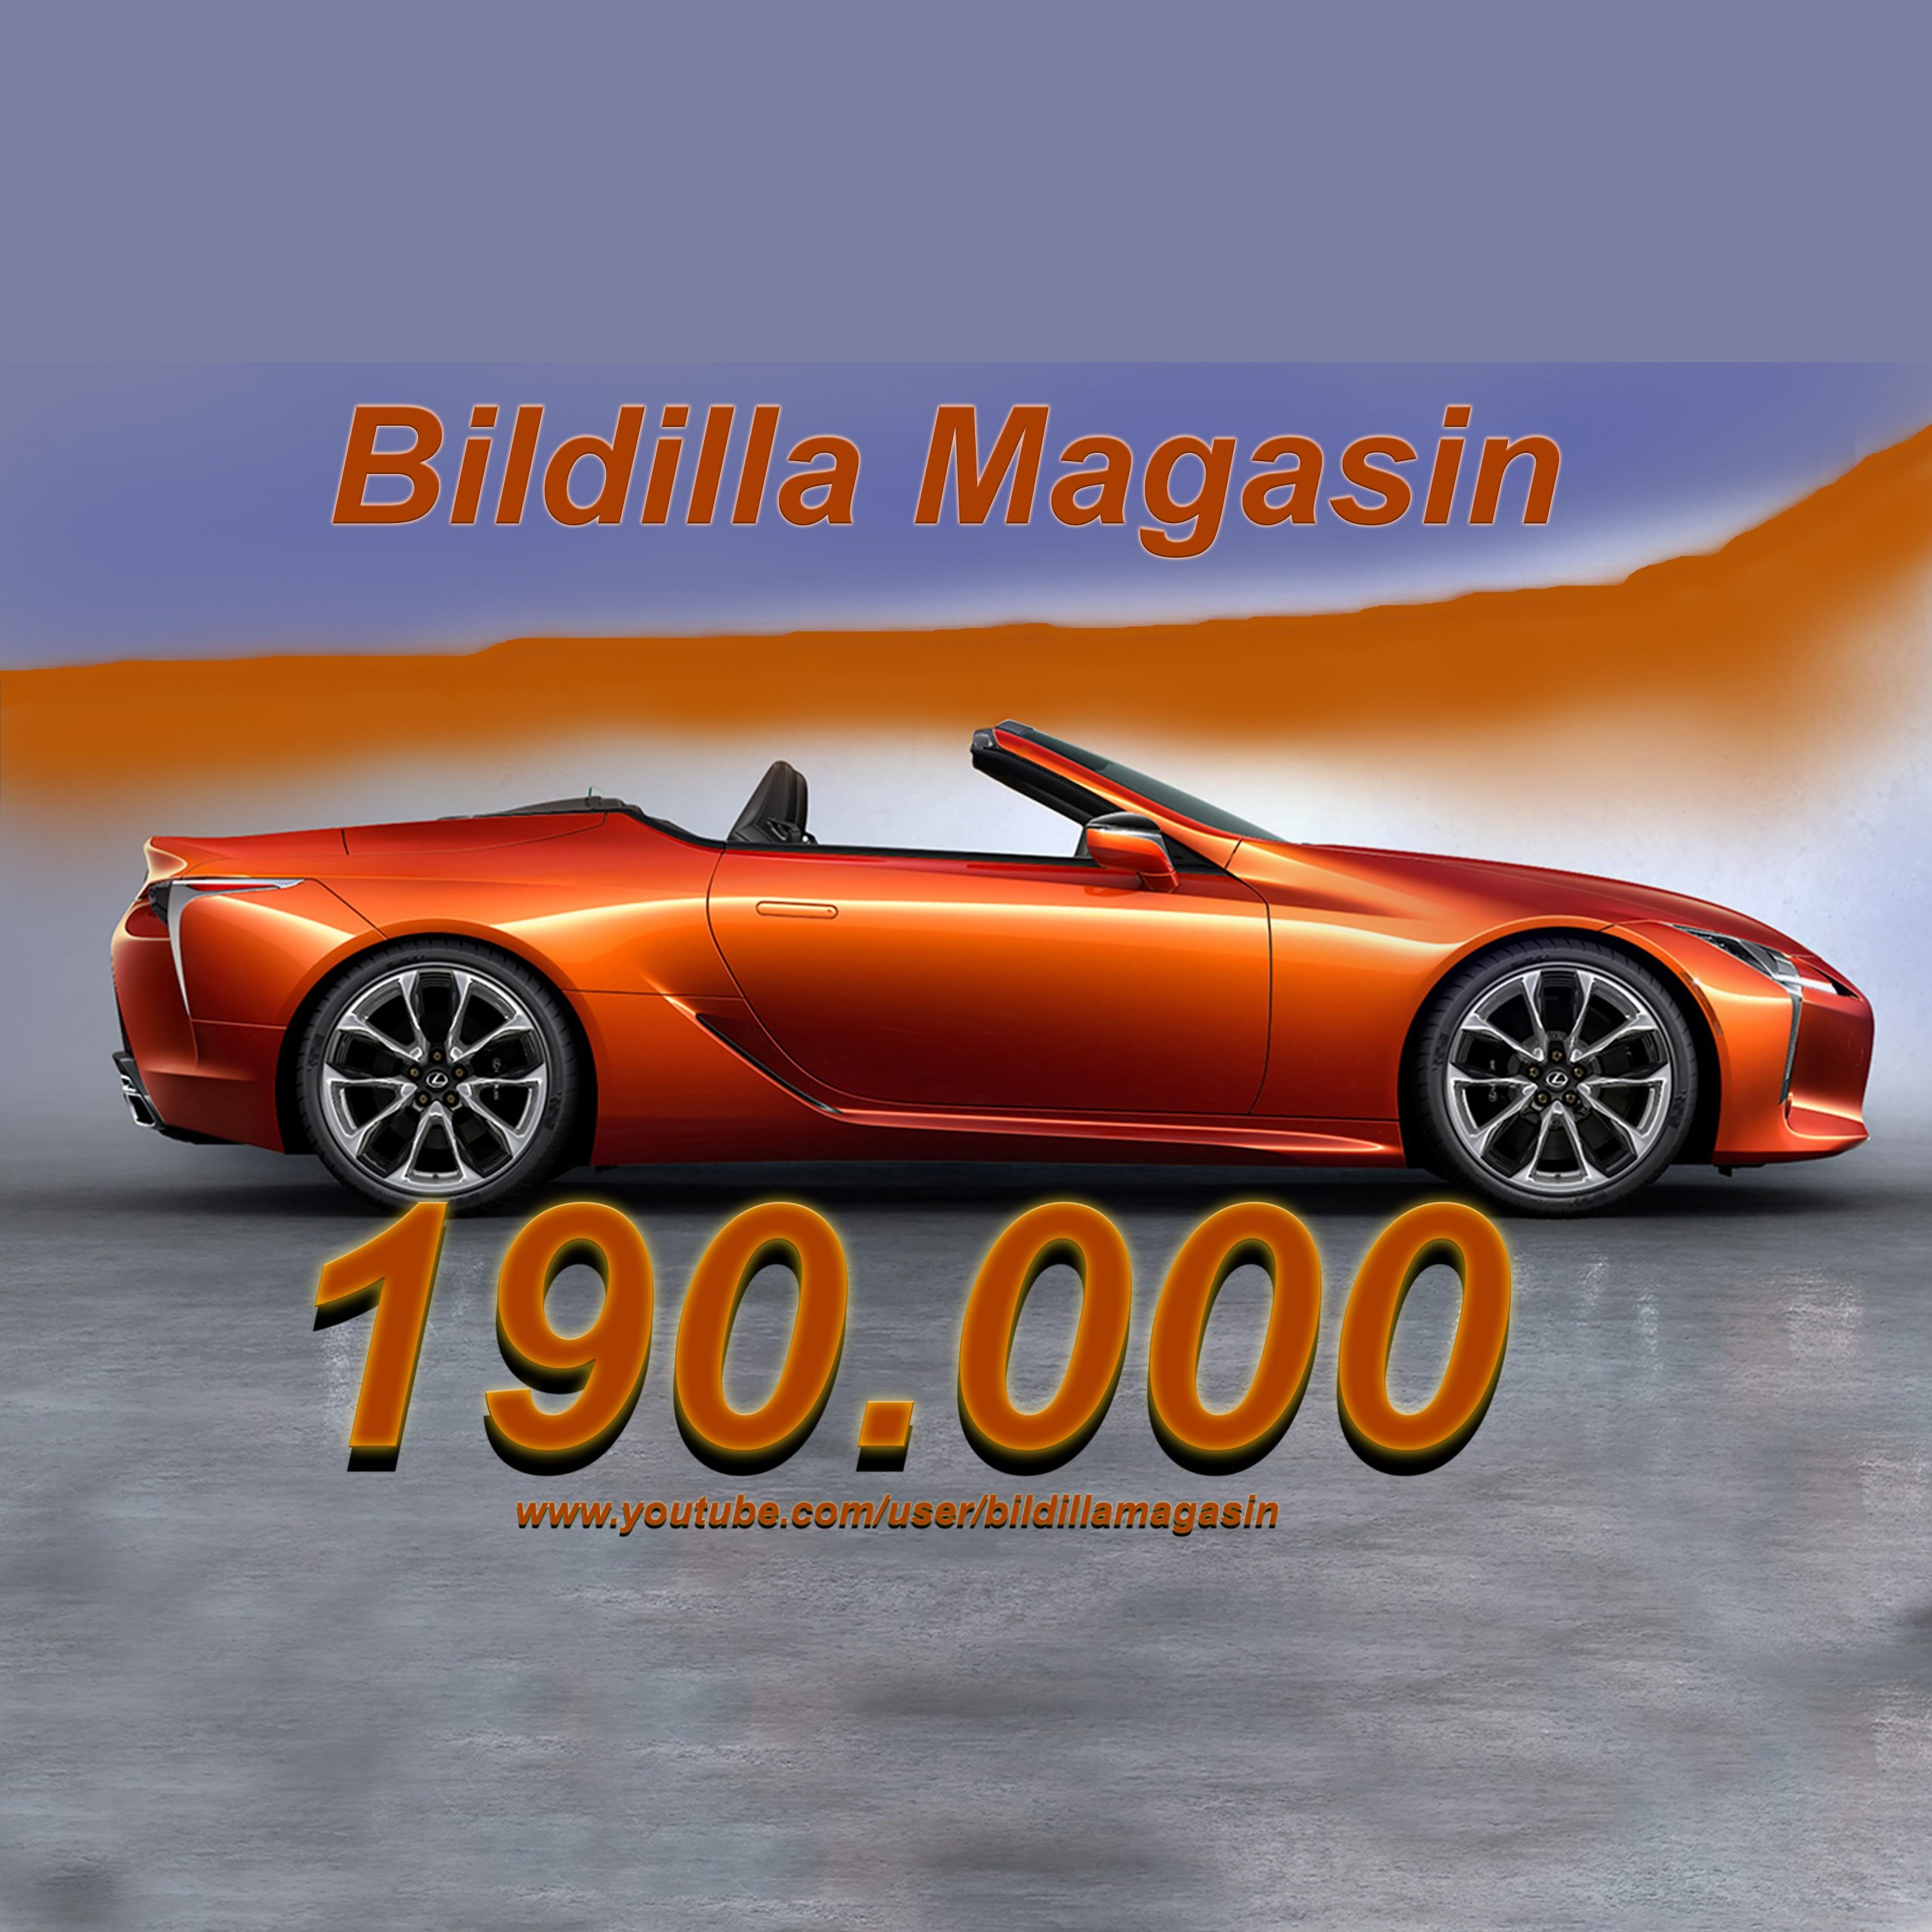 Bildilla Magasin på YouTube, 190 000 avspillinger